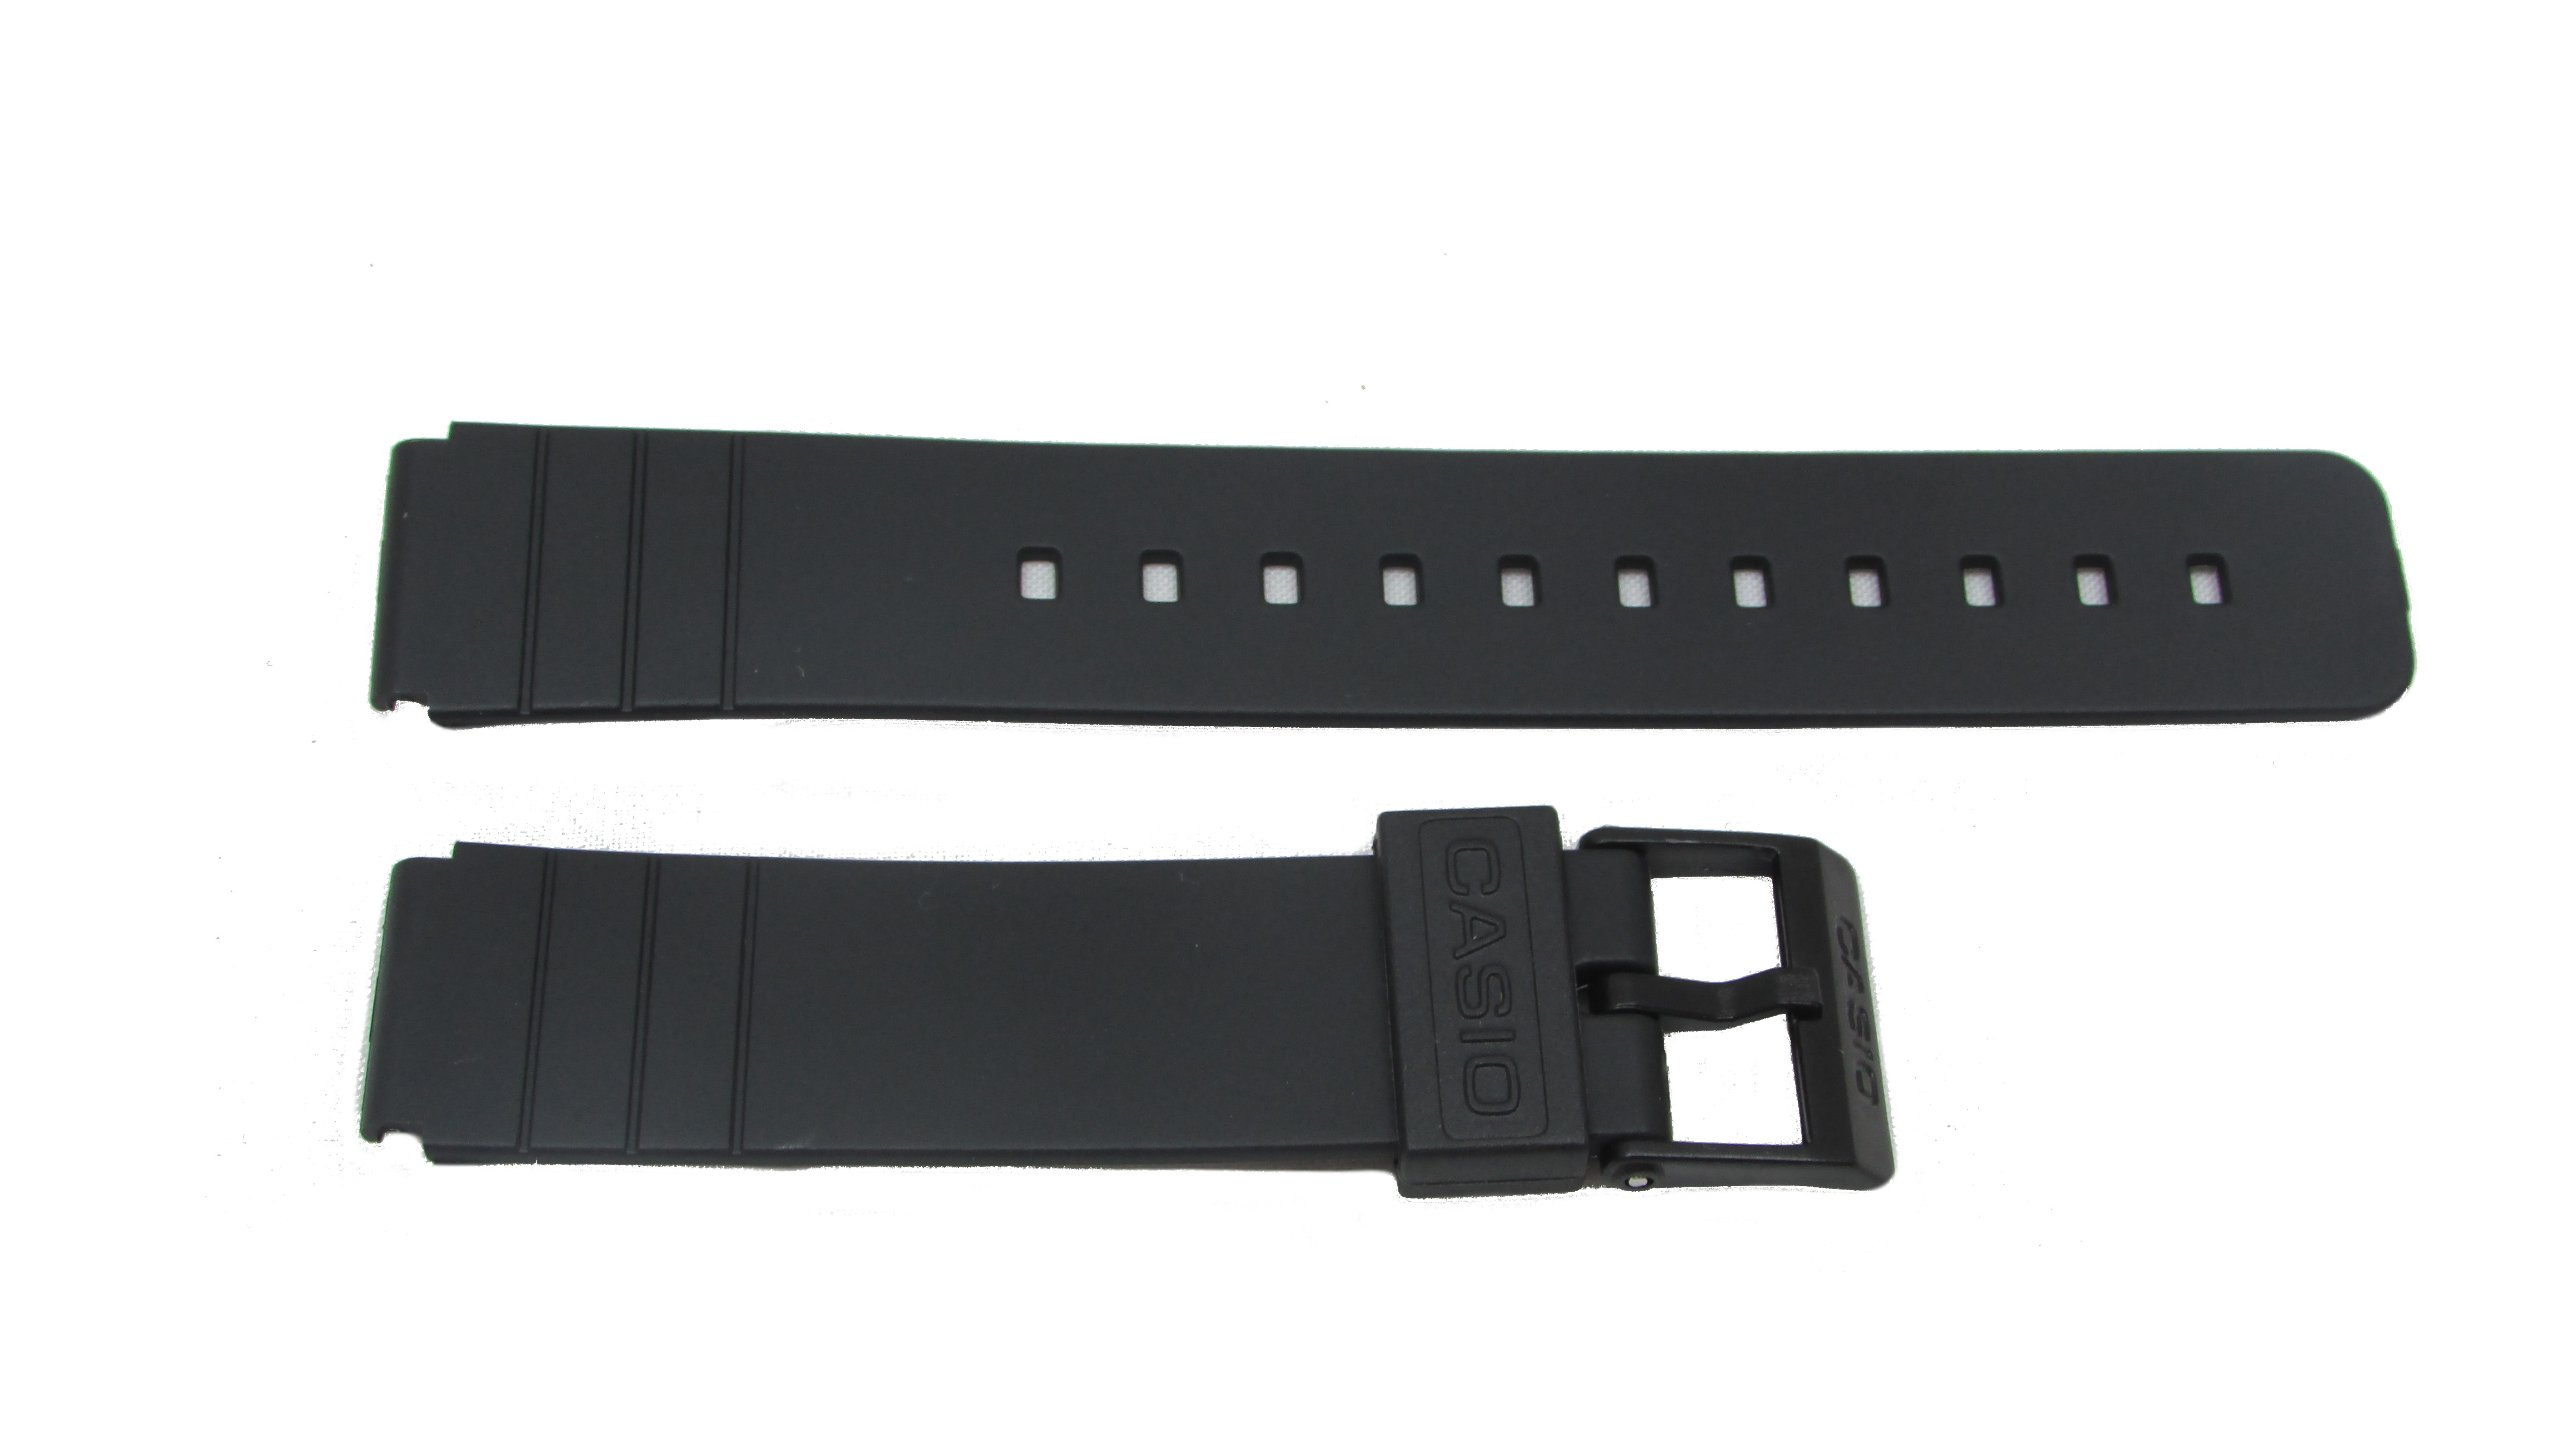 Casio Rubber Watch Band-16mm Fits: MQ-24CC-4B2W, MQ-24CC-4B3W, MQ-24CC-9B2W, MQ-24-1B2LSW, MQ-24-1B3LLSW, MQ-24-1B3LSW, MQ-24-1BLLSW, MQ-24-1BLSW, MQ-24-ELSW, MQ-24-7B2LLSW